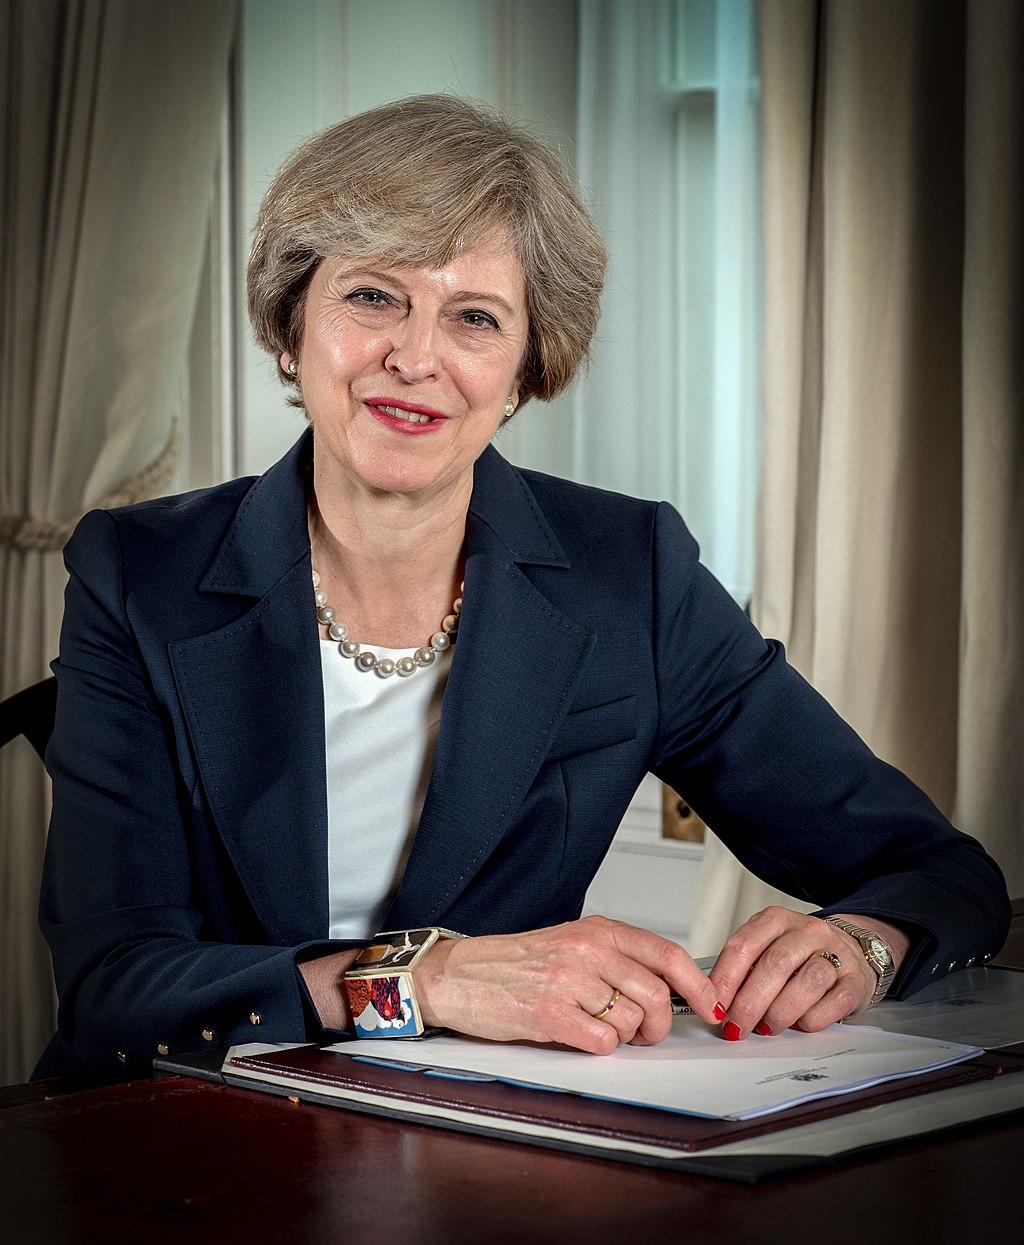 Theresa May. CC License from WikiPedia.